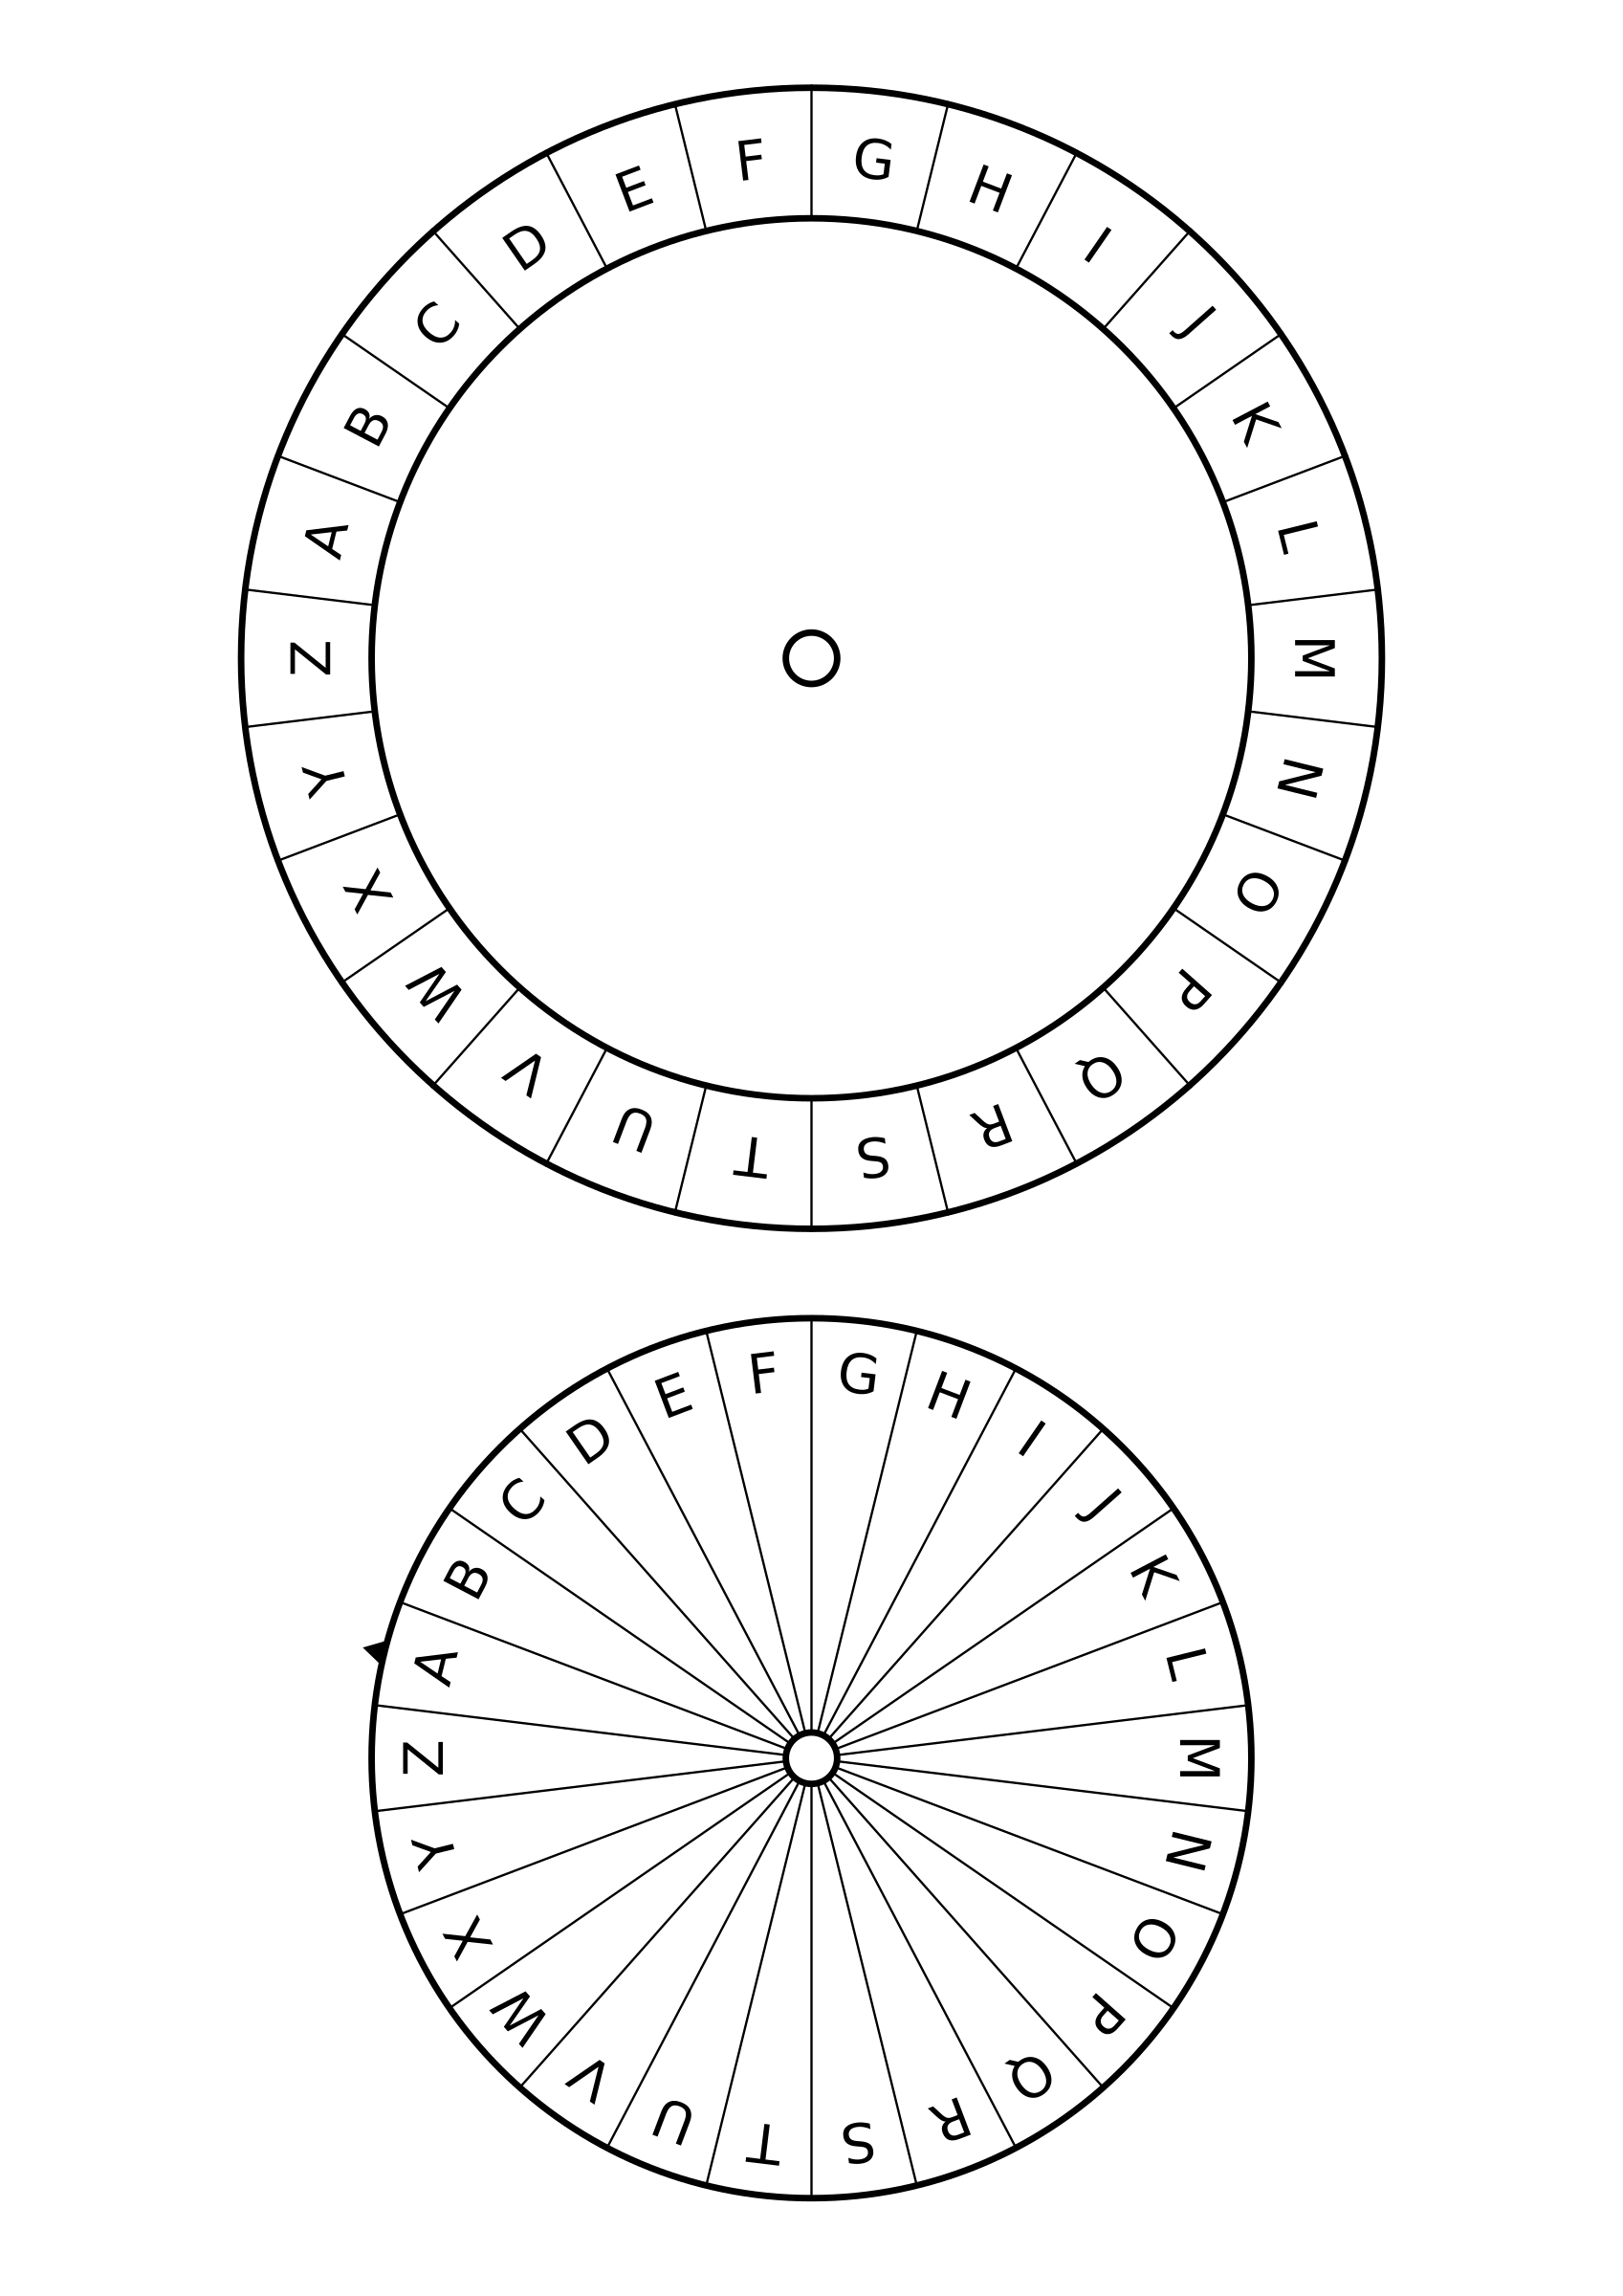 B clipart template. Caesar cipher big image